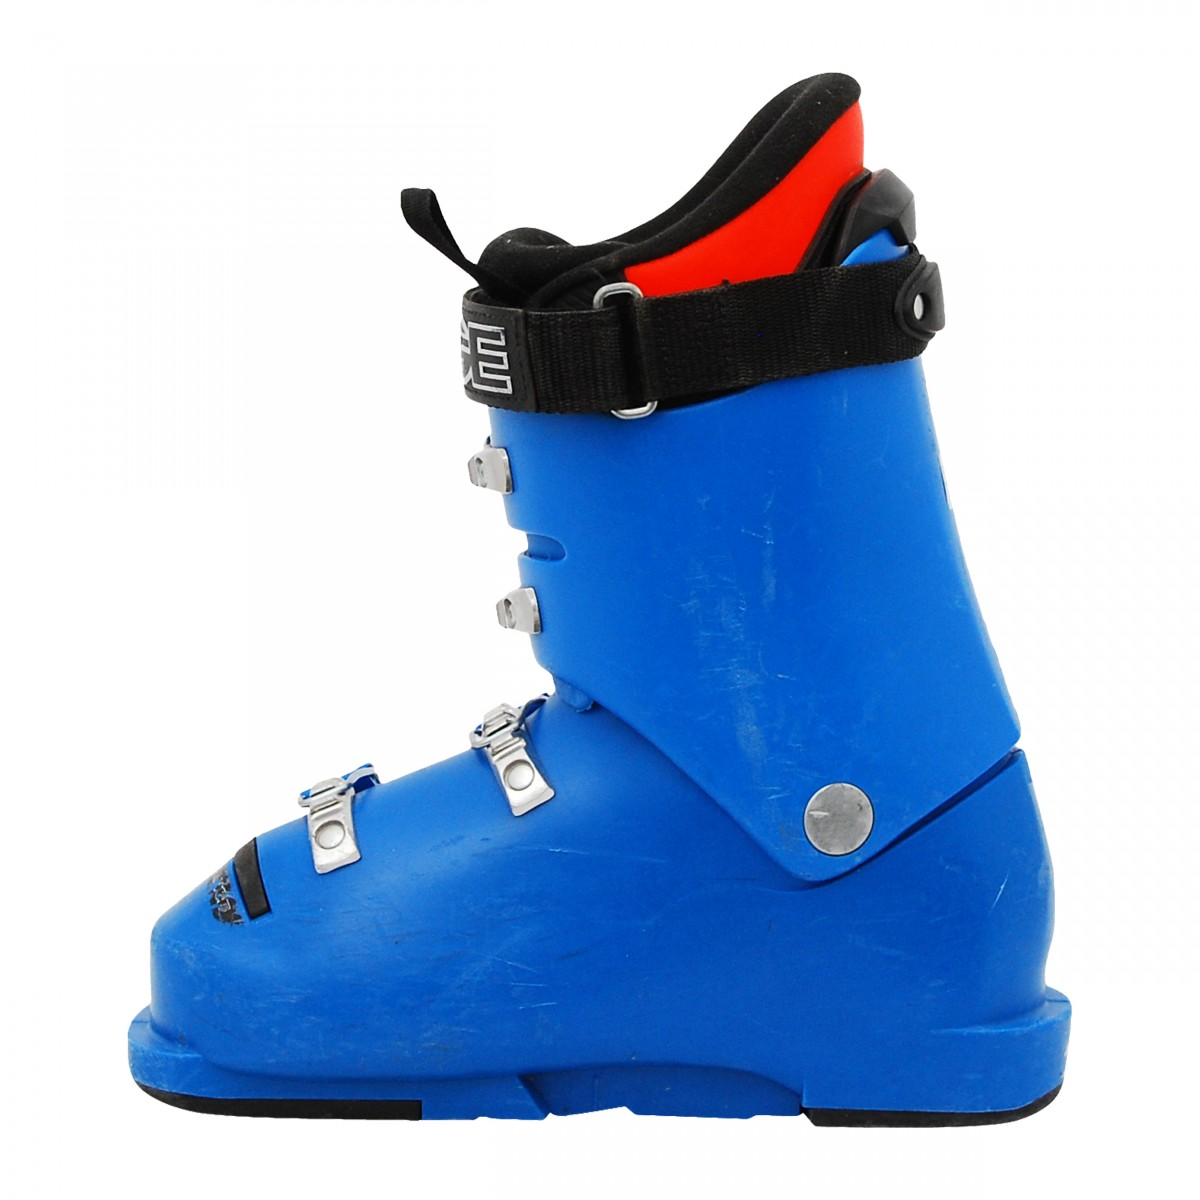 Chaussure-de-Ski-Occasion-Junior-Lange-RSJ-65-bleu-orange miniature 4